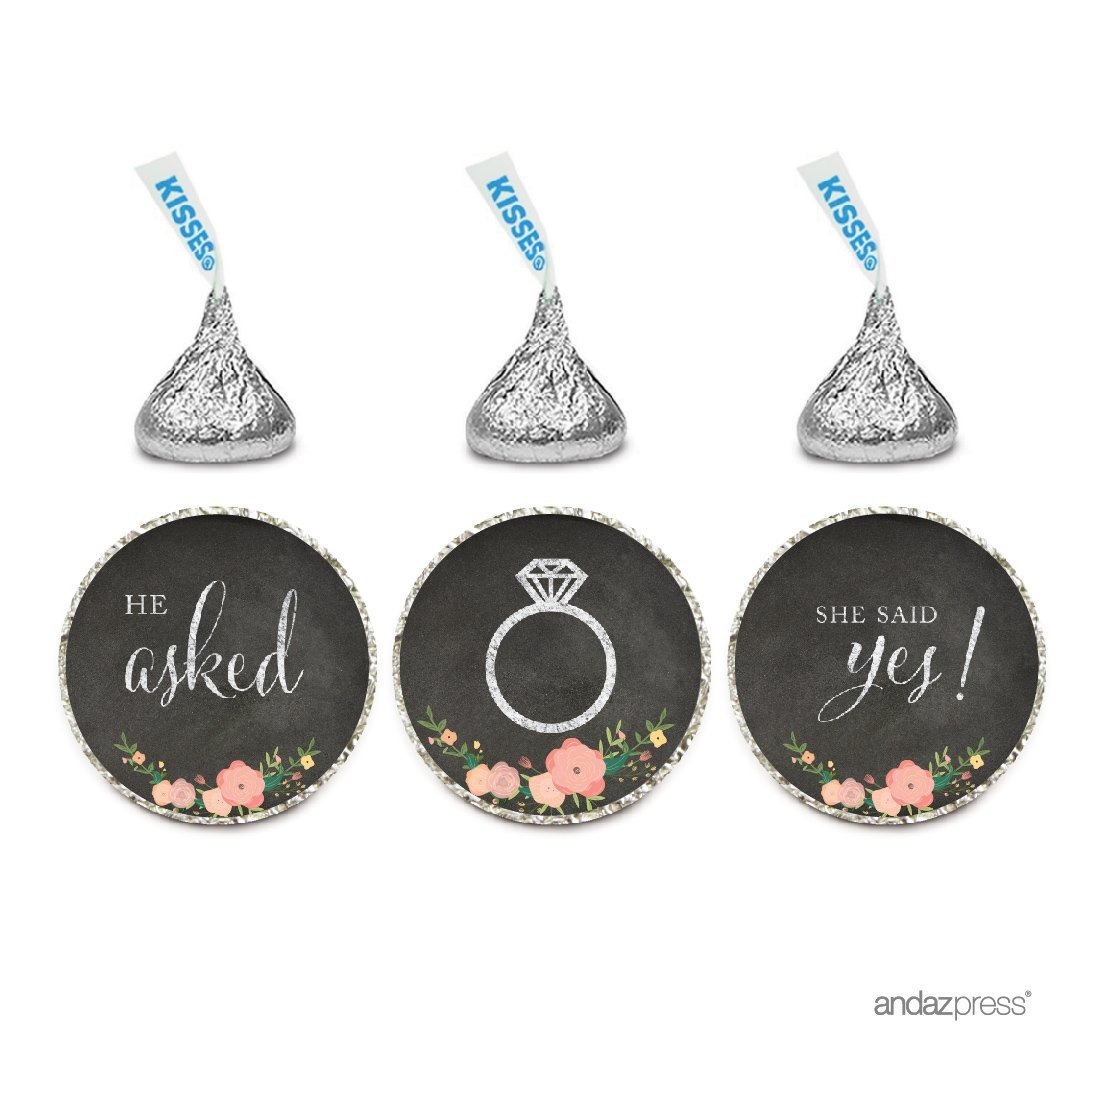 Amazon.com: Andaz Press Chocolate Drop Labels Stickers, Wedding He ...